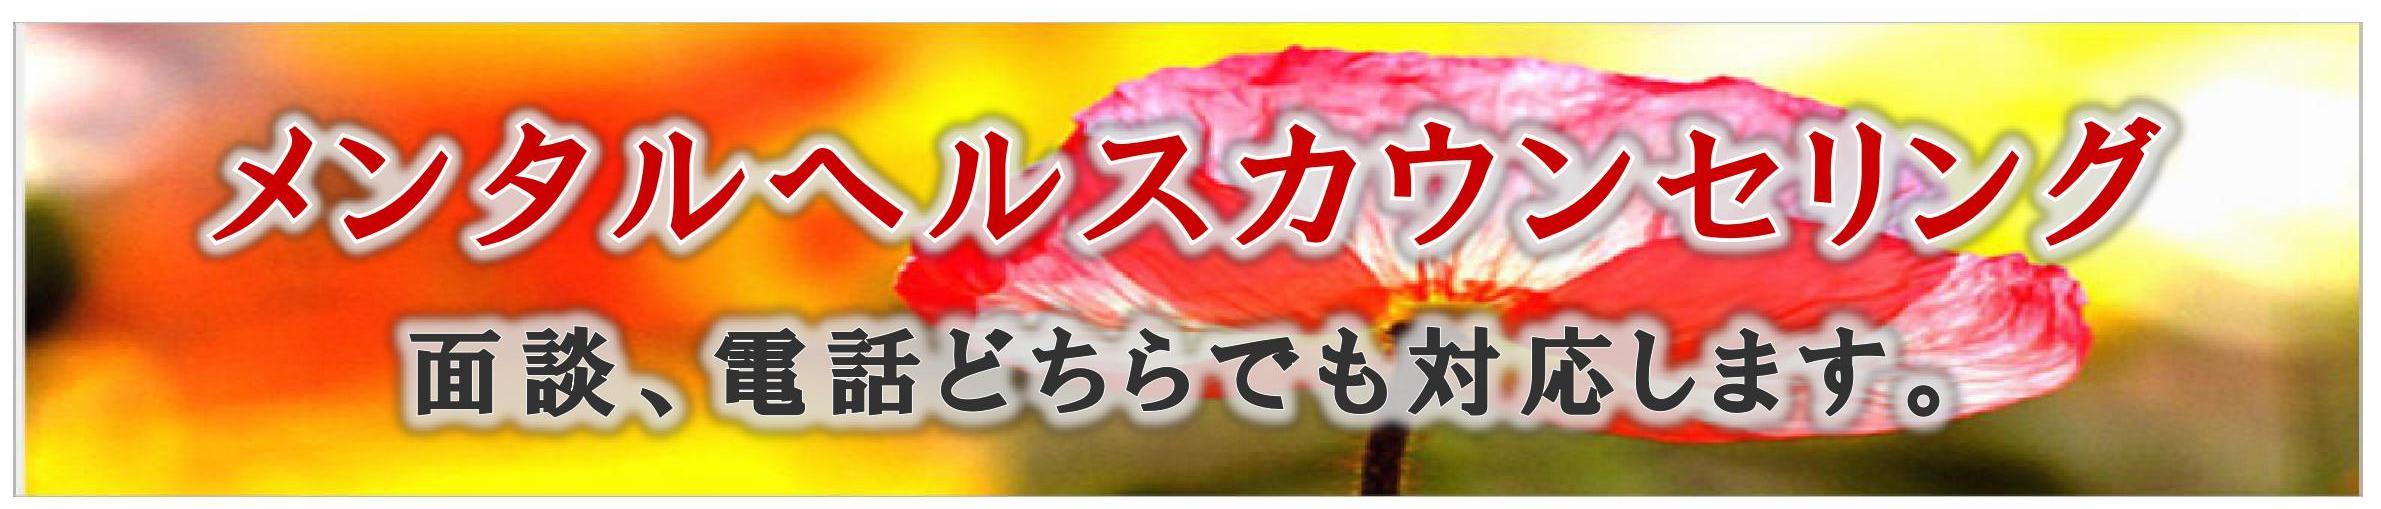 image-0001 (29).jpg